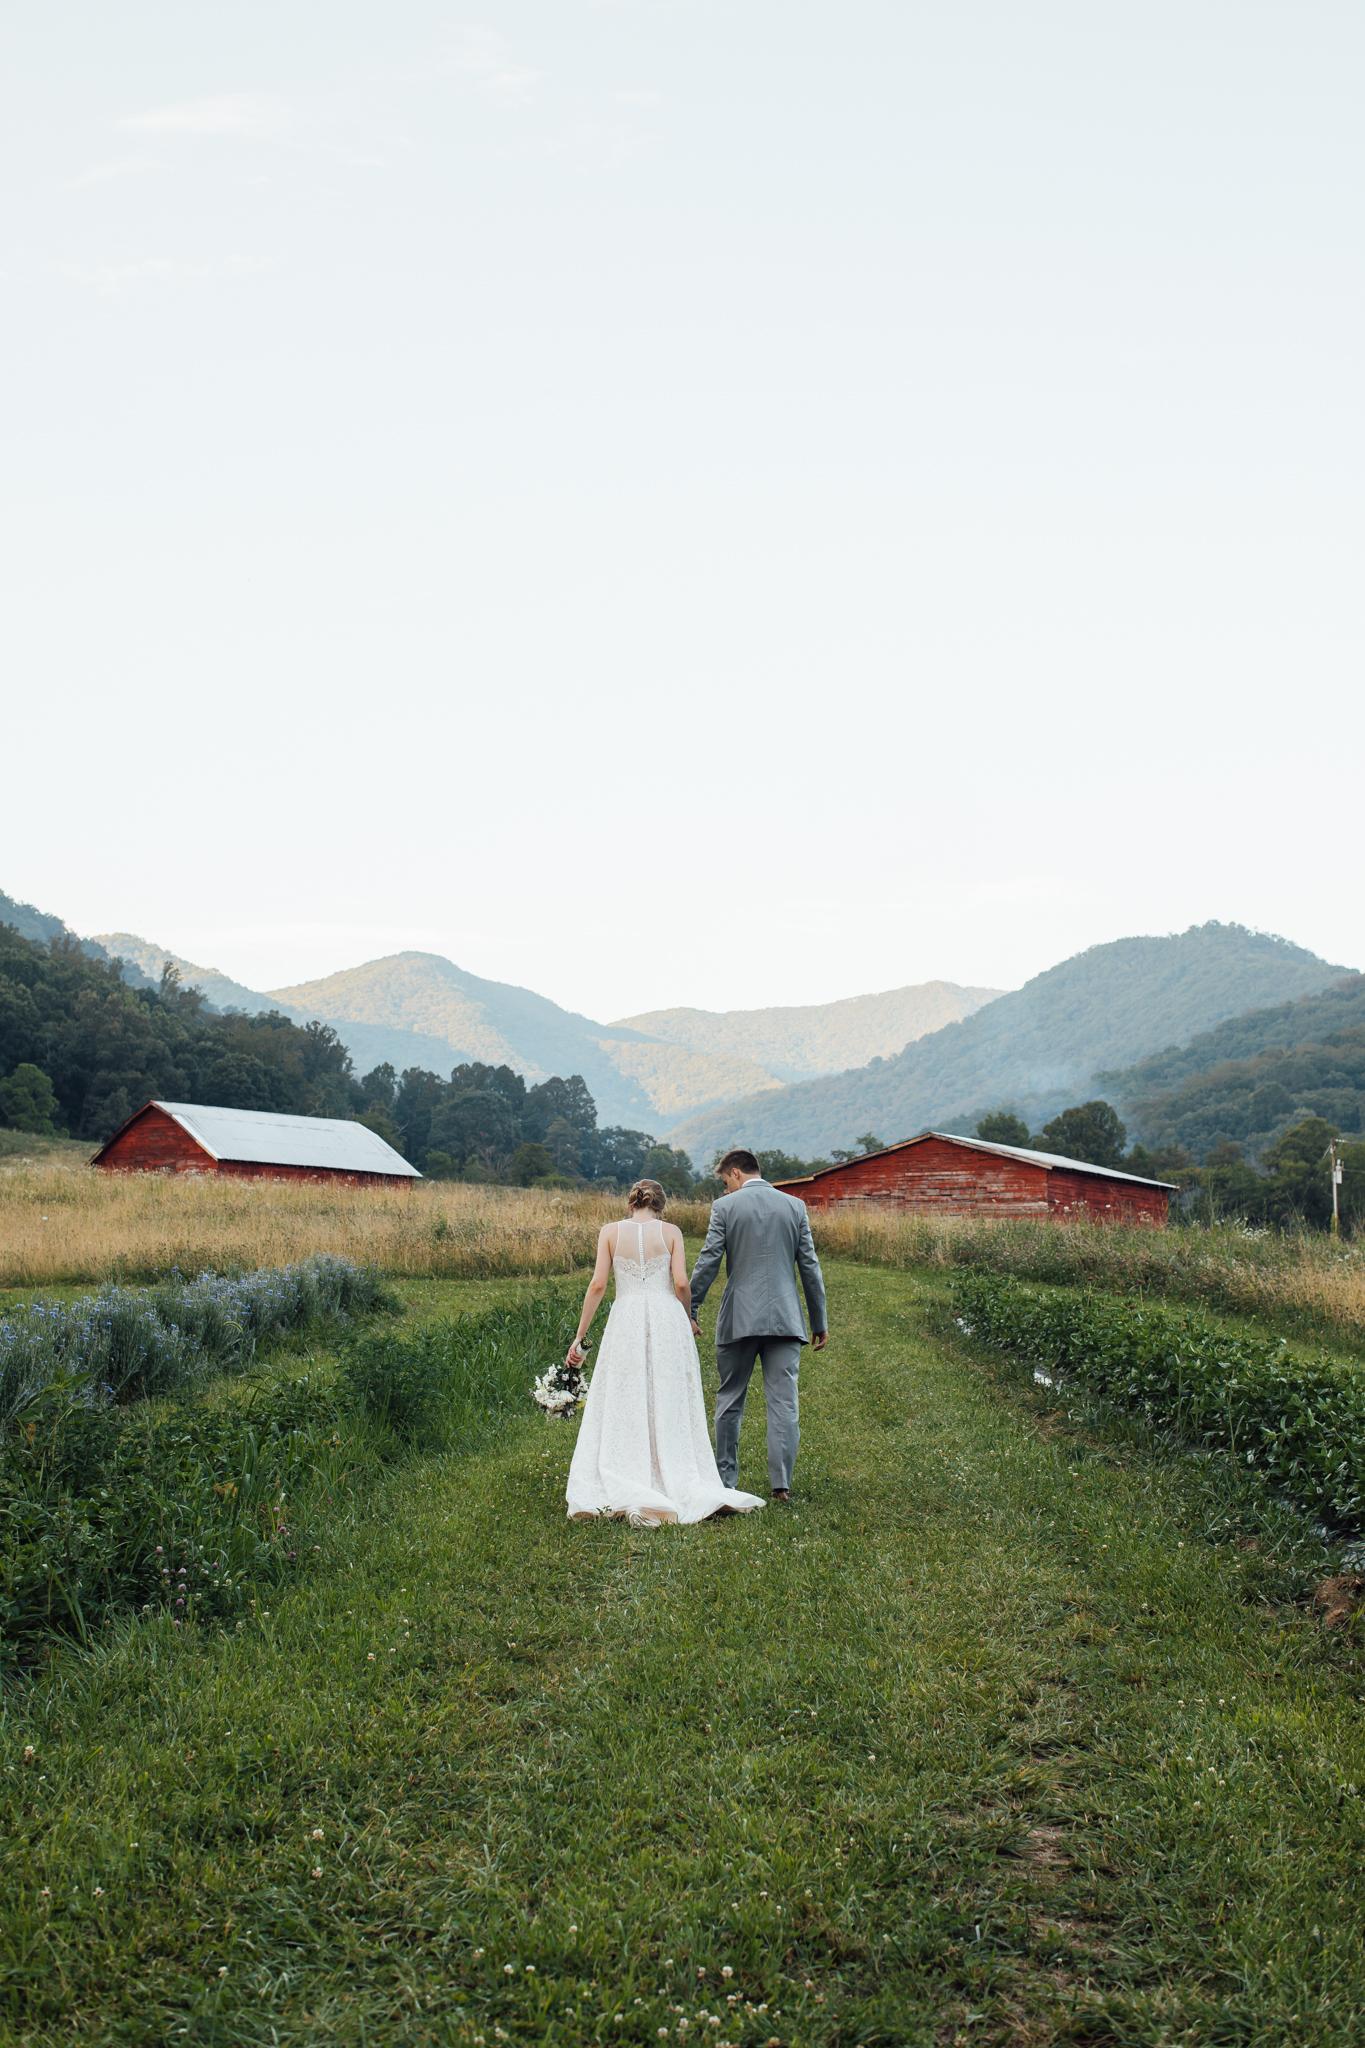 asheville-wedding-photographers-TheBasilicaofSt.Lawrence-IvyCreekFamilyFarm-thewarmtharoundyou (42 of 52).jpg